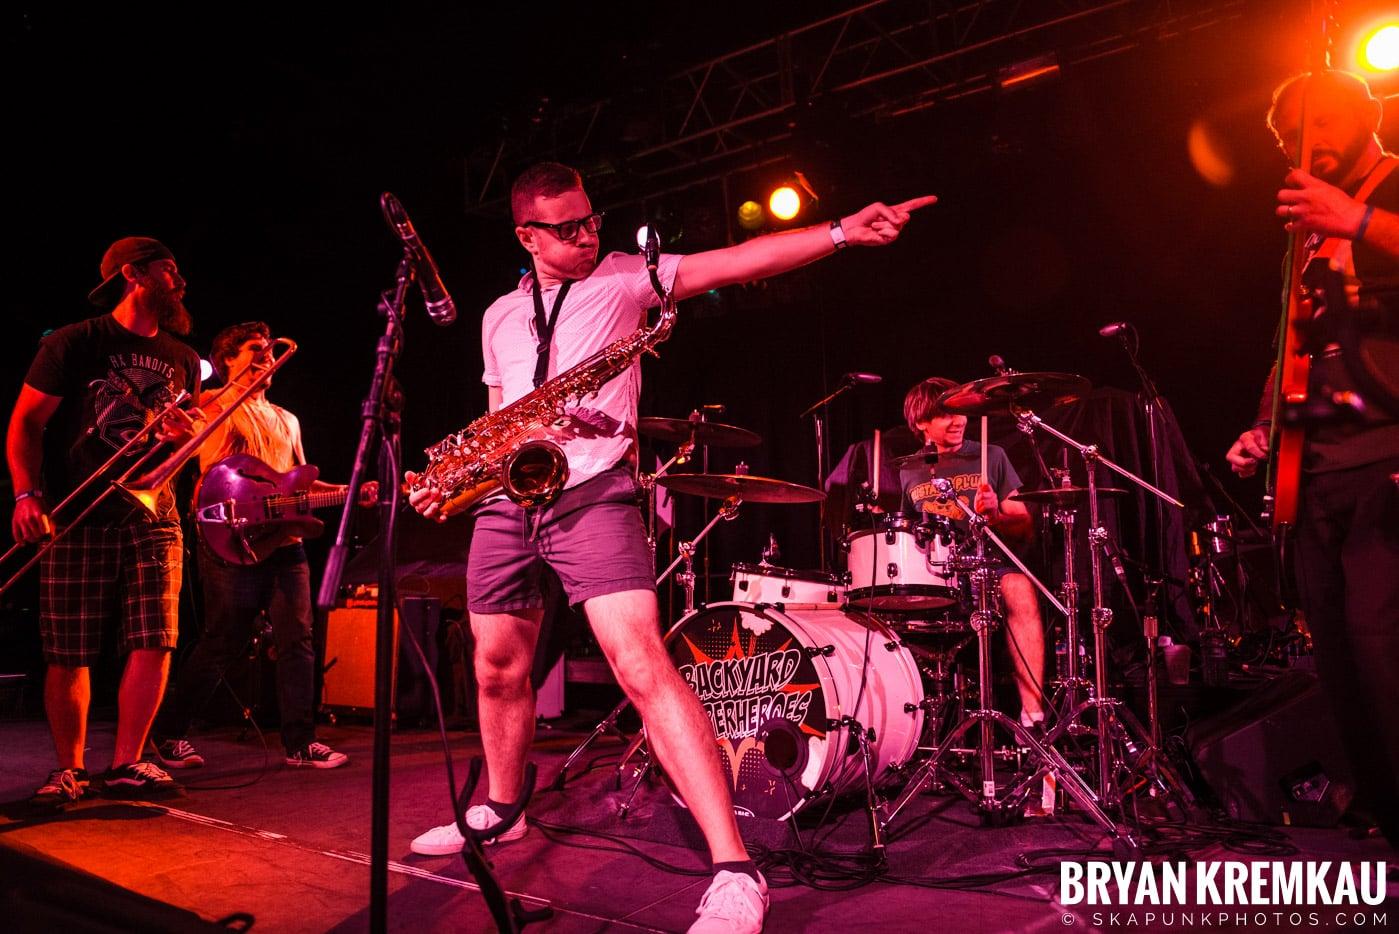 Backyard Superheroes @ Starland Ballroom, Sayreville, NJ - 7.29.17 (24)